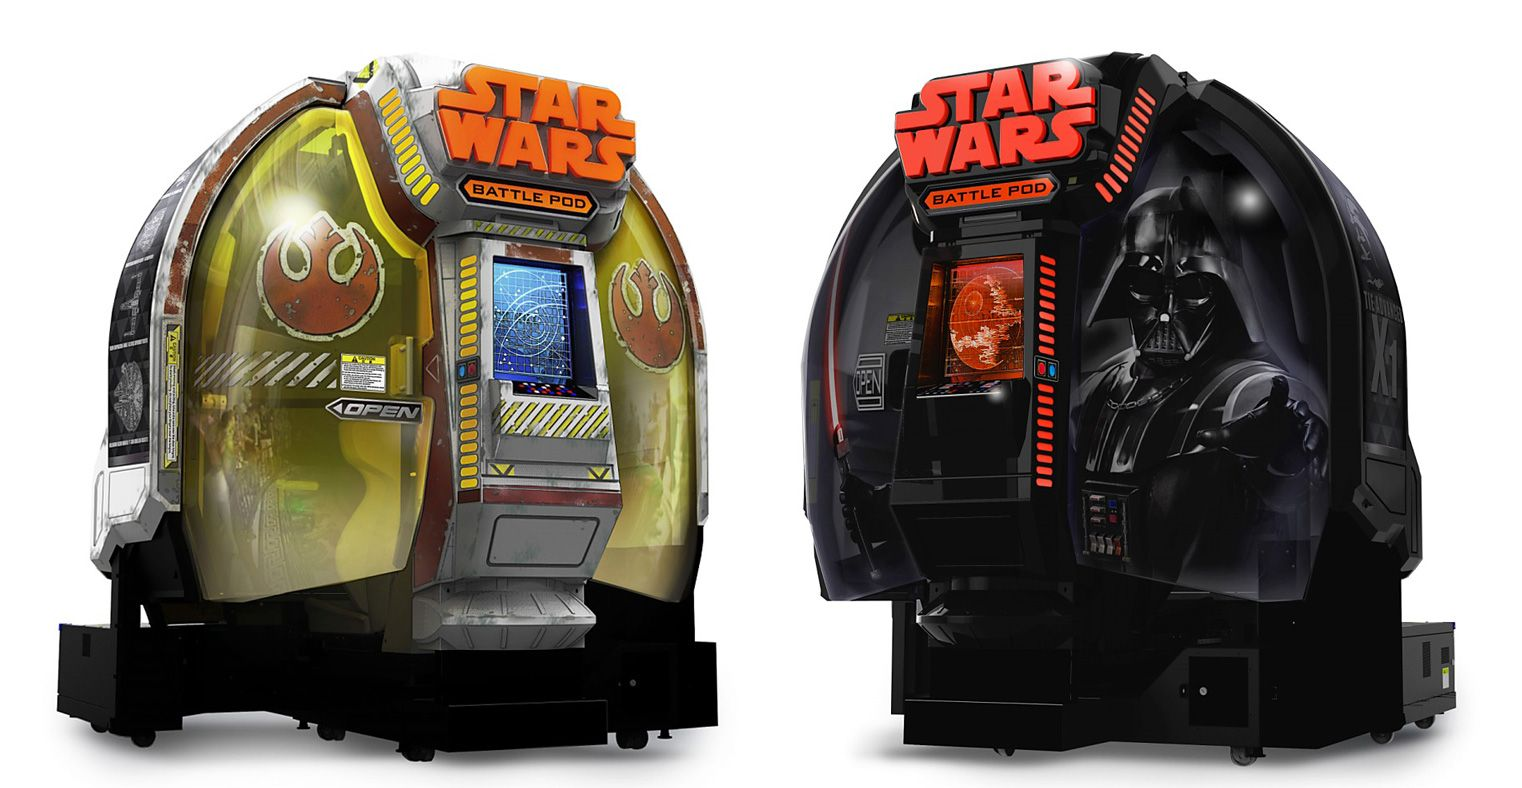 star_wars_battle_pod_arcade.jpg